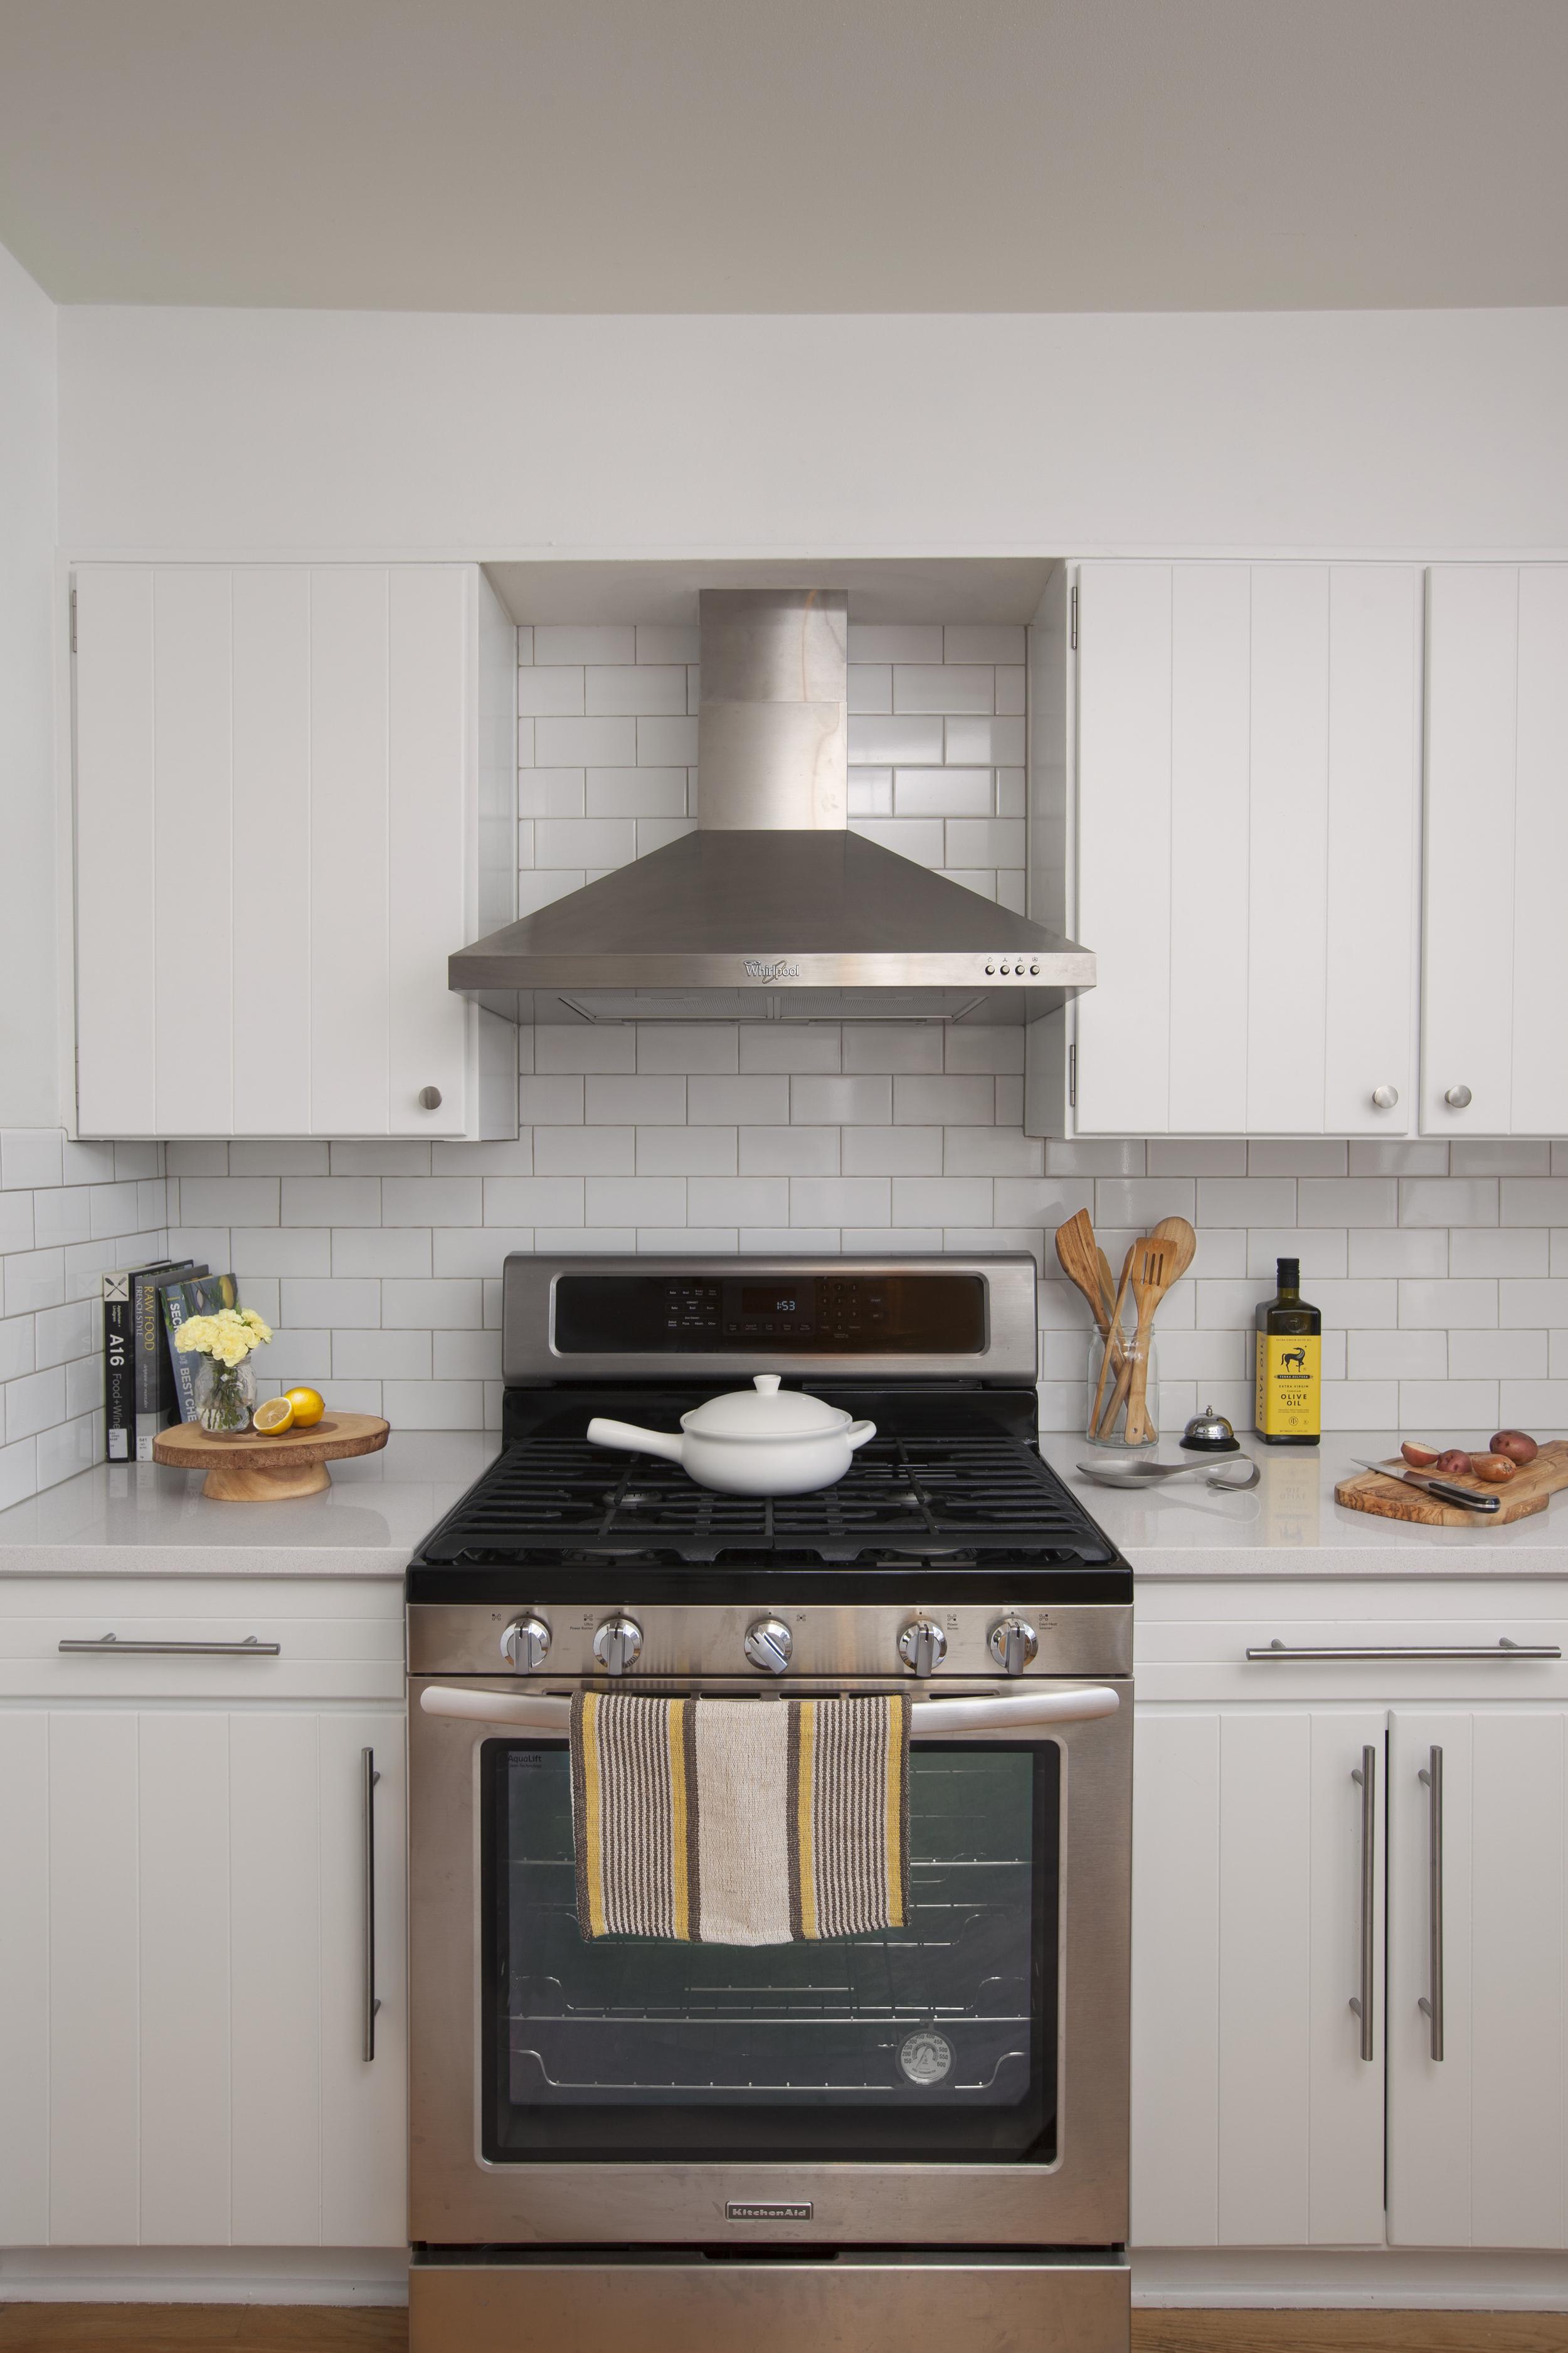 JZID-Kitchen-Wide-Angle_1.jpg